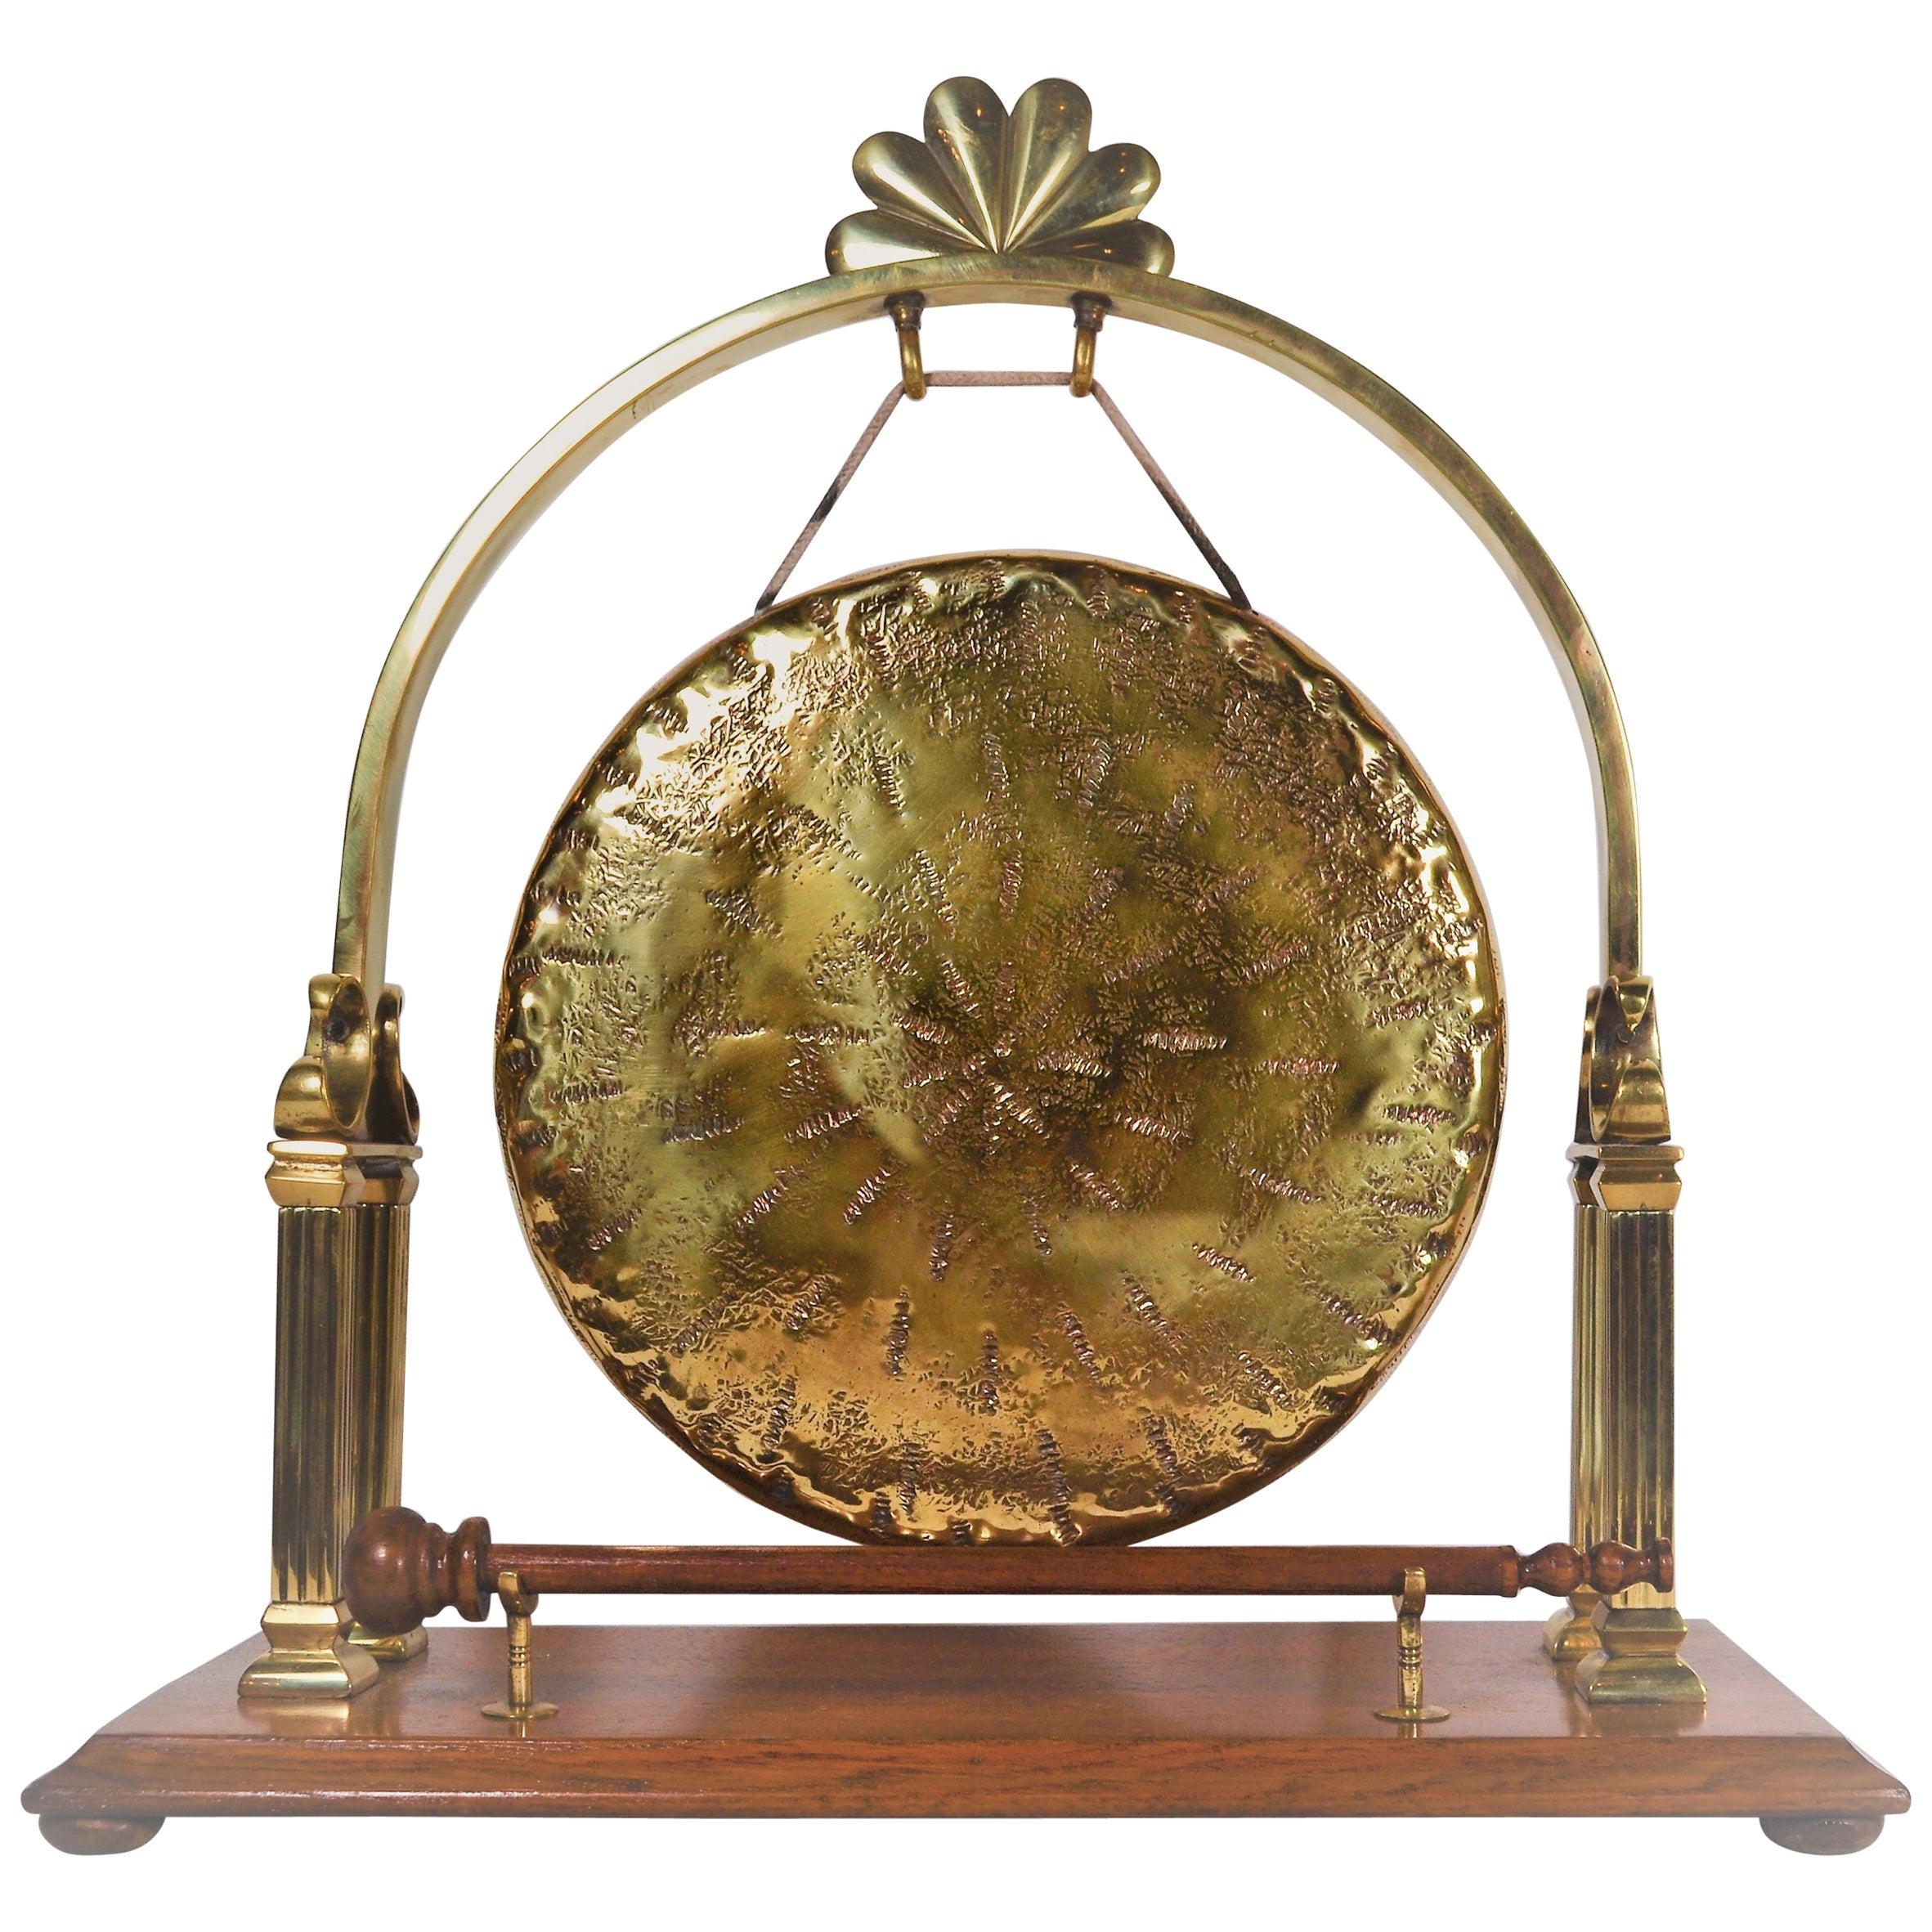 Antique English Brass and Oak Dinner Gong, circa 1890